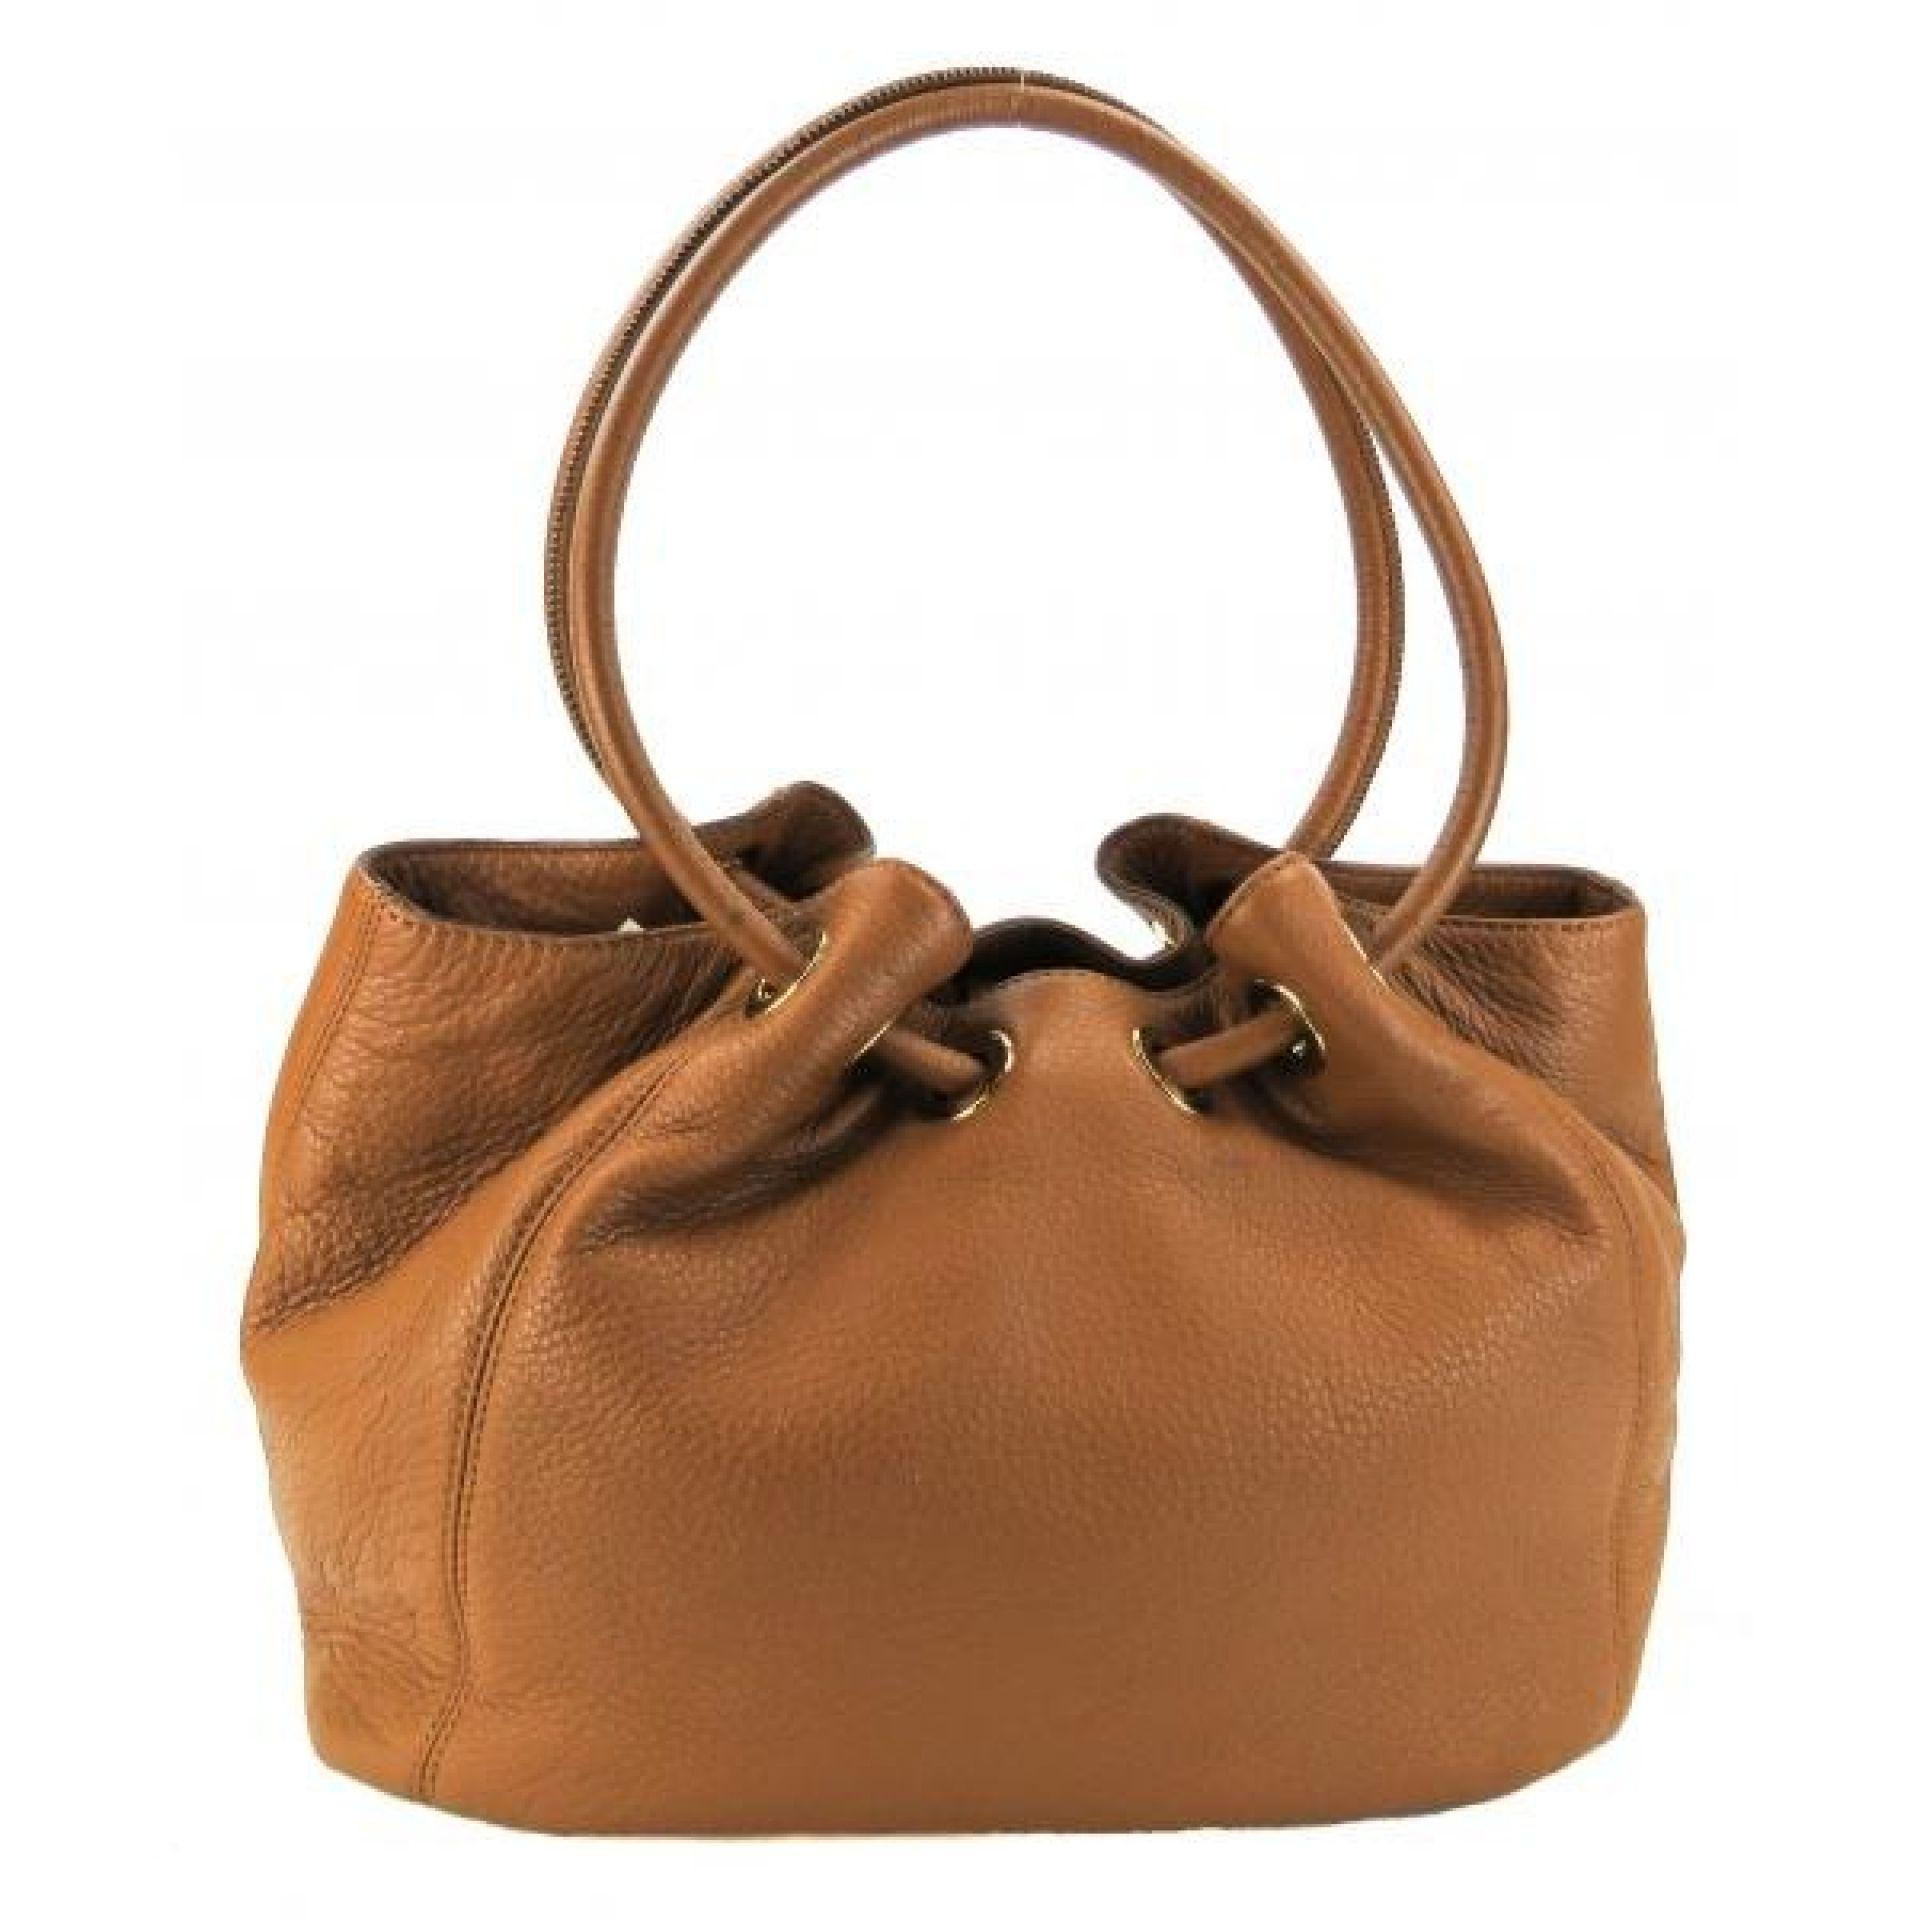 MICHAEL Michael Kors Tan Leather Medium East West Ring Tote Bag